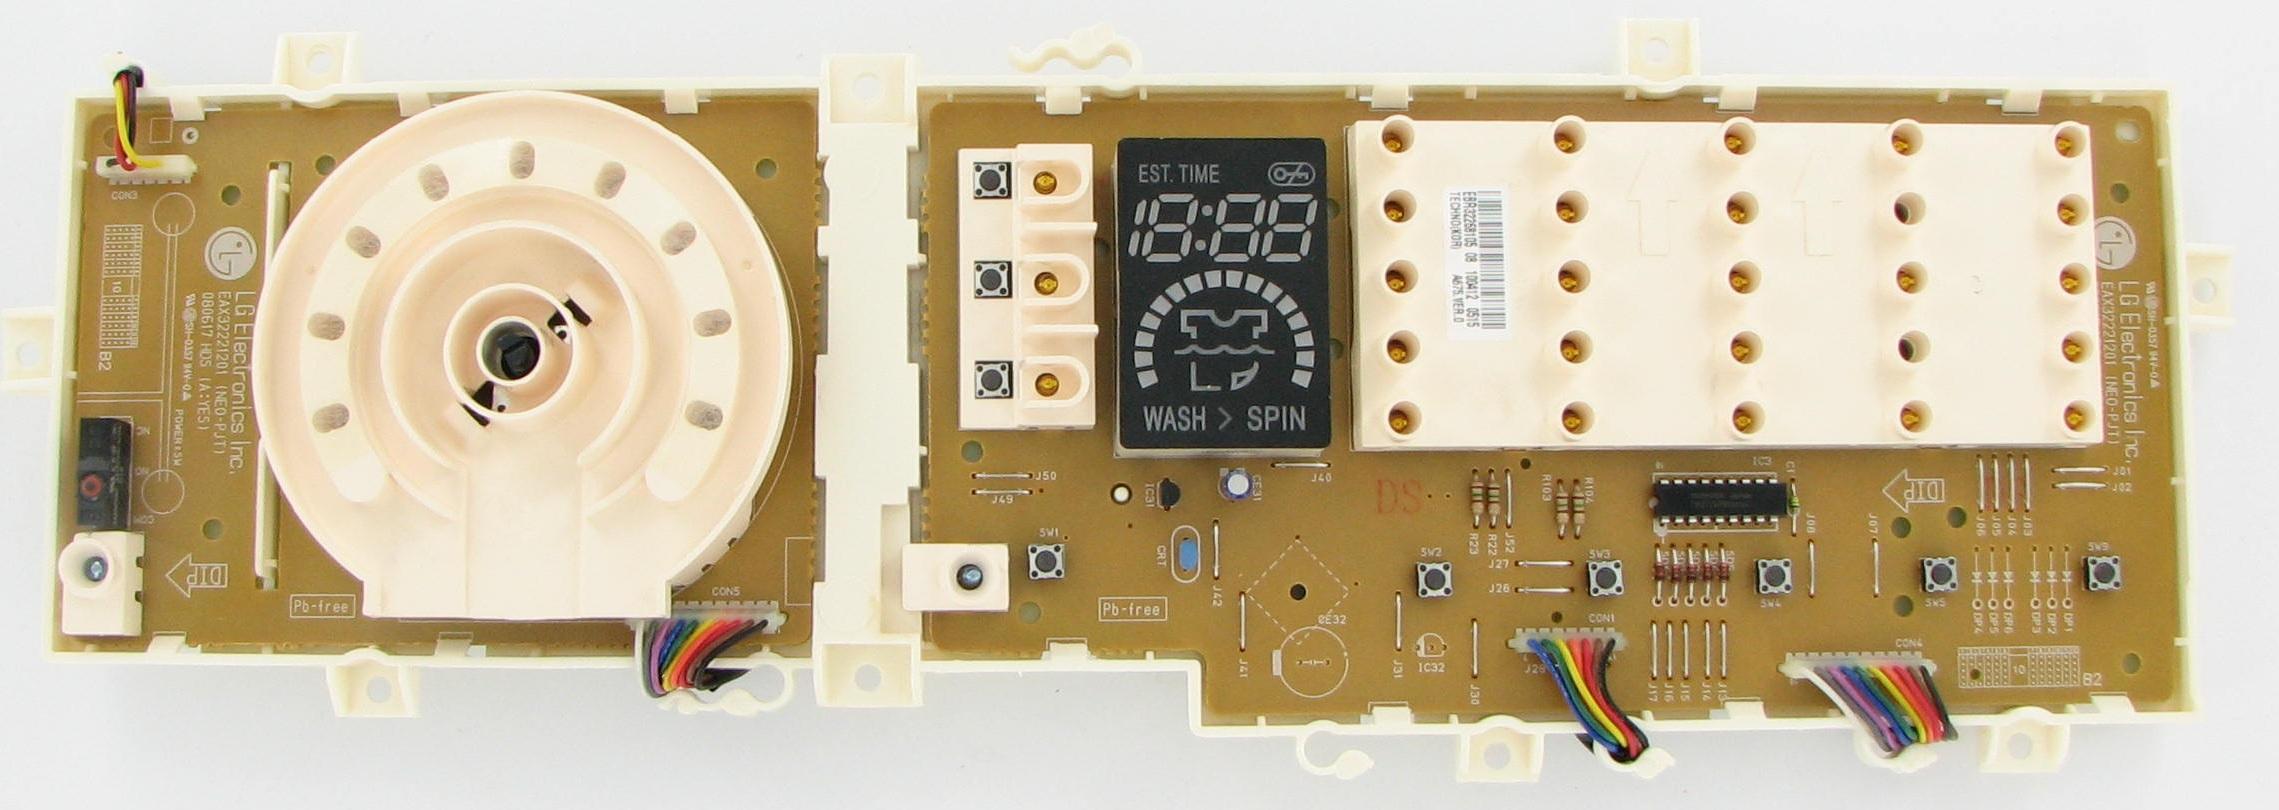 1A2 Lg Washer Control Board EBR36525154     Tested works great!